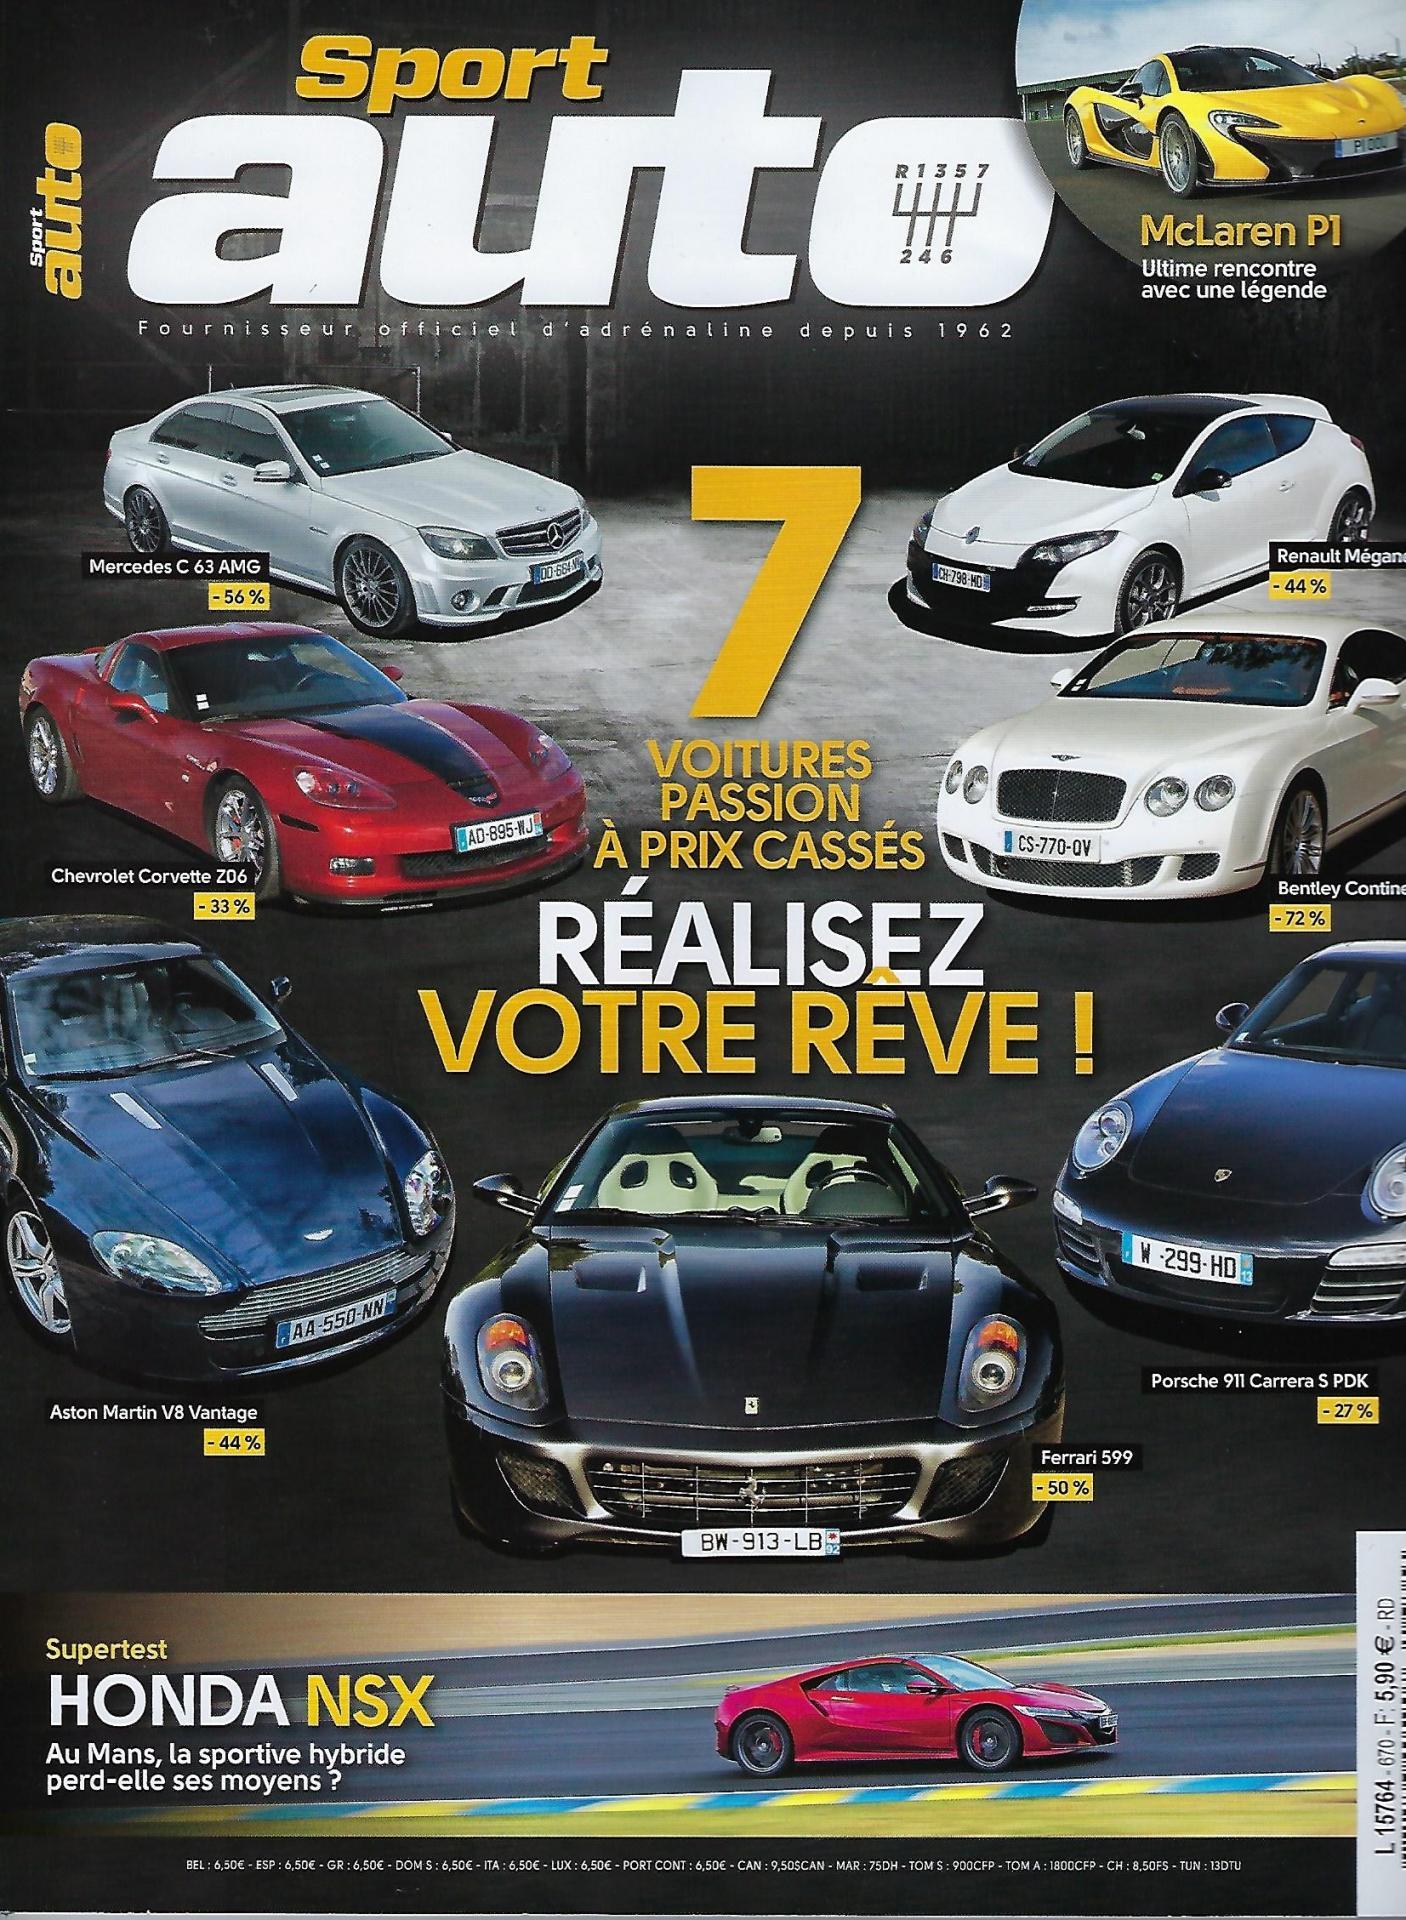 Sport auto reportage drivecar page 1 jpeg